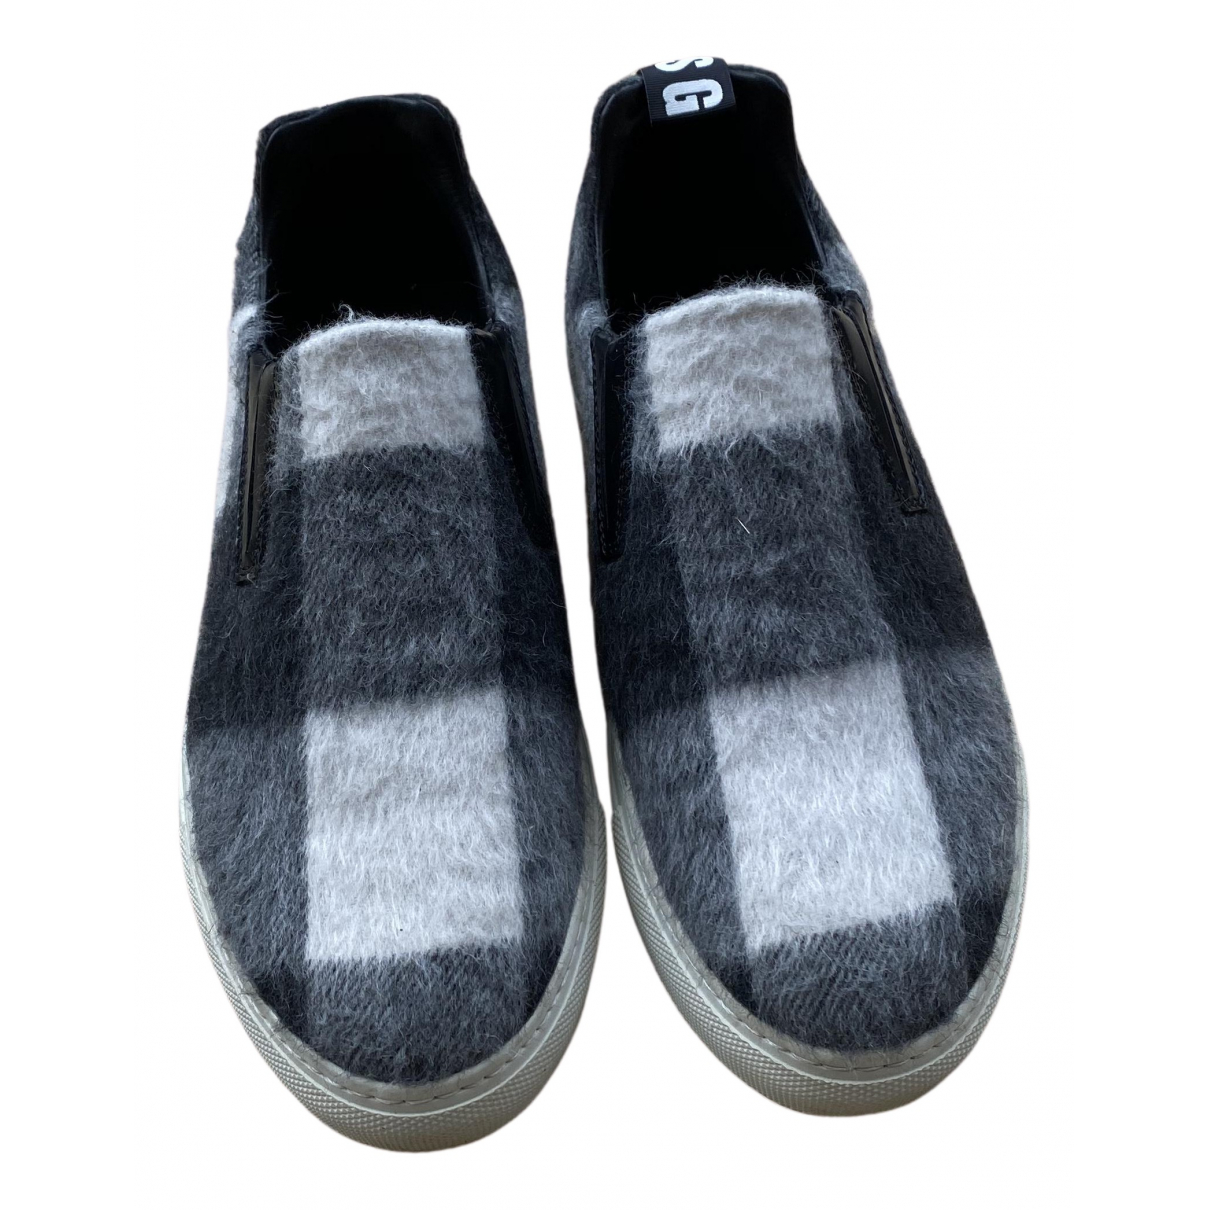 Msgm \N Sneakers in  Anthrazit Lackleder